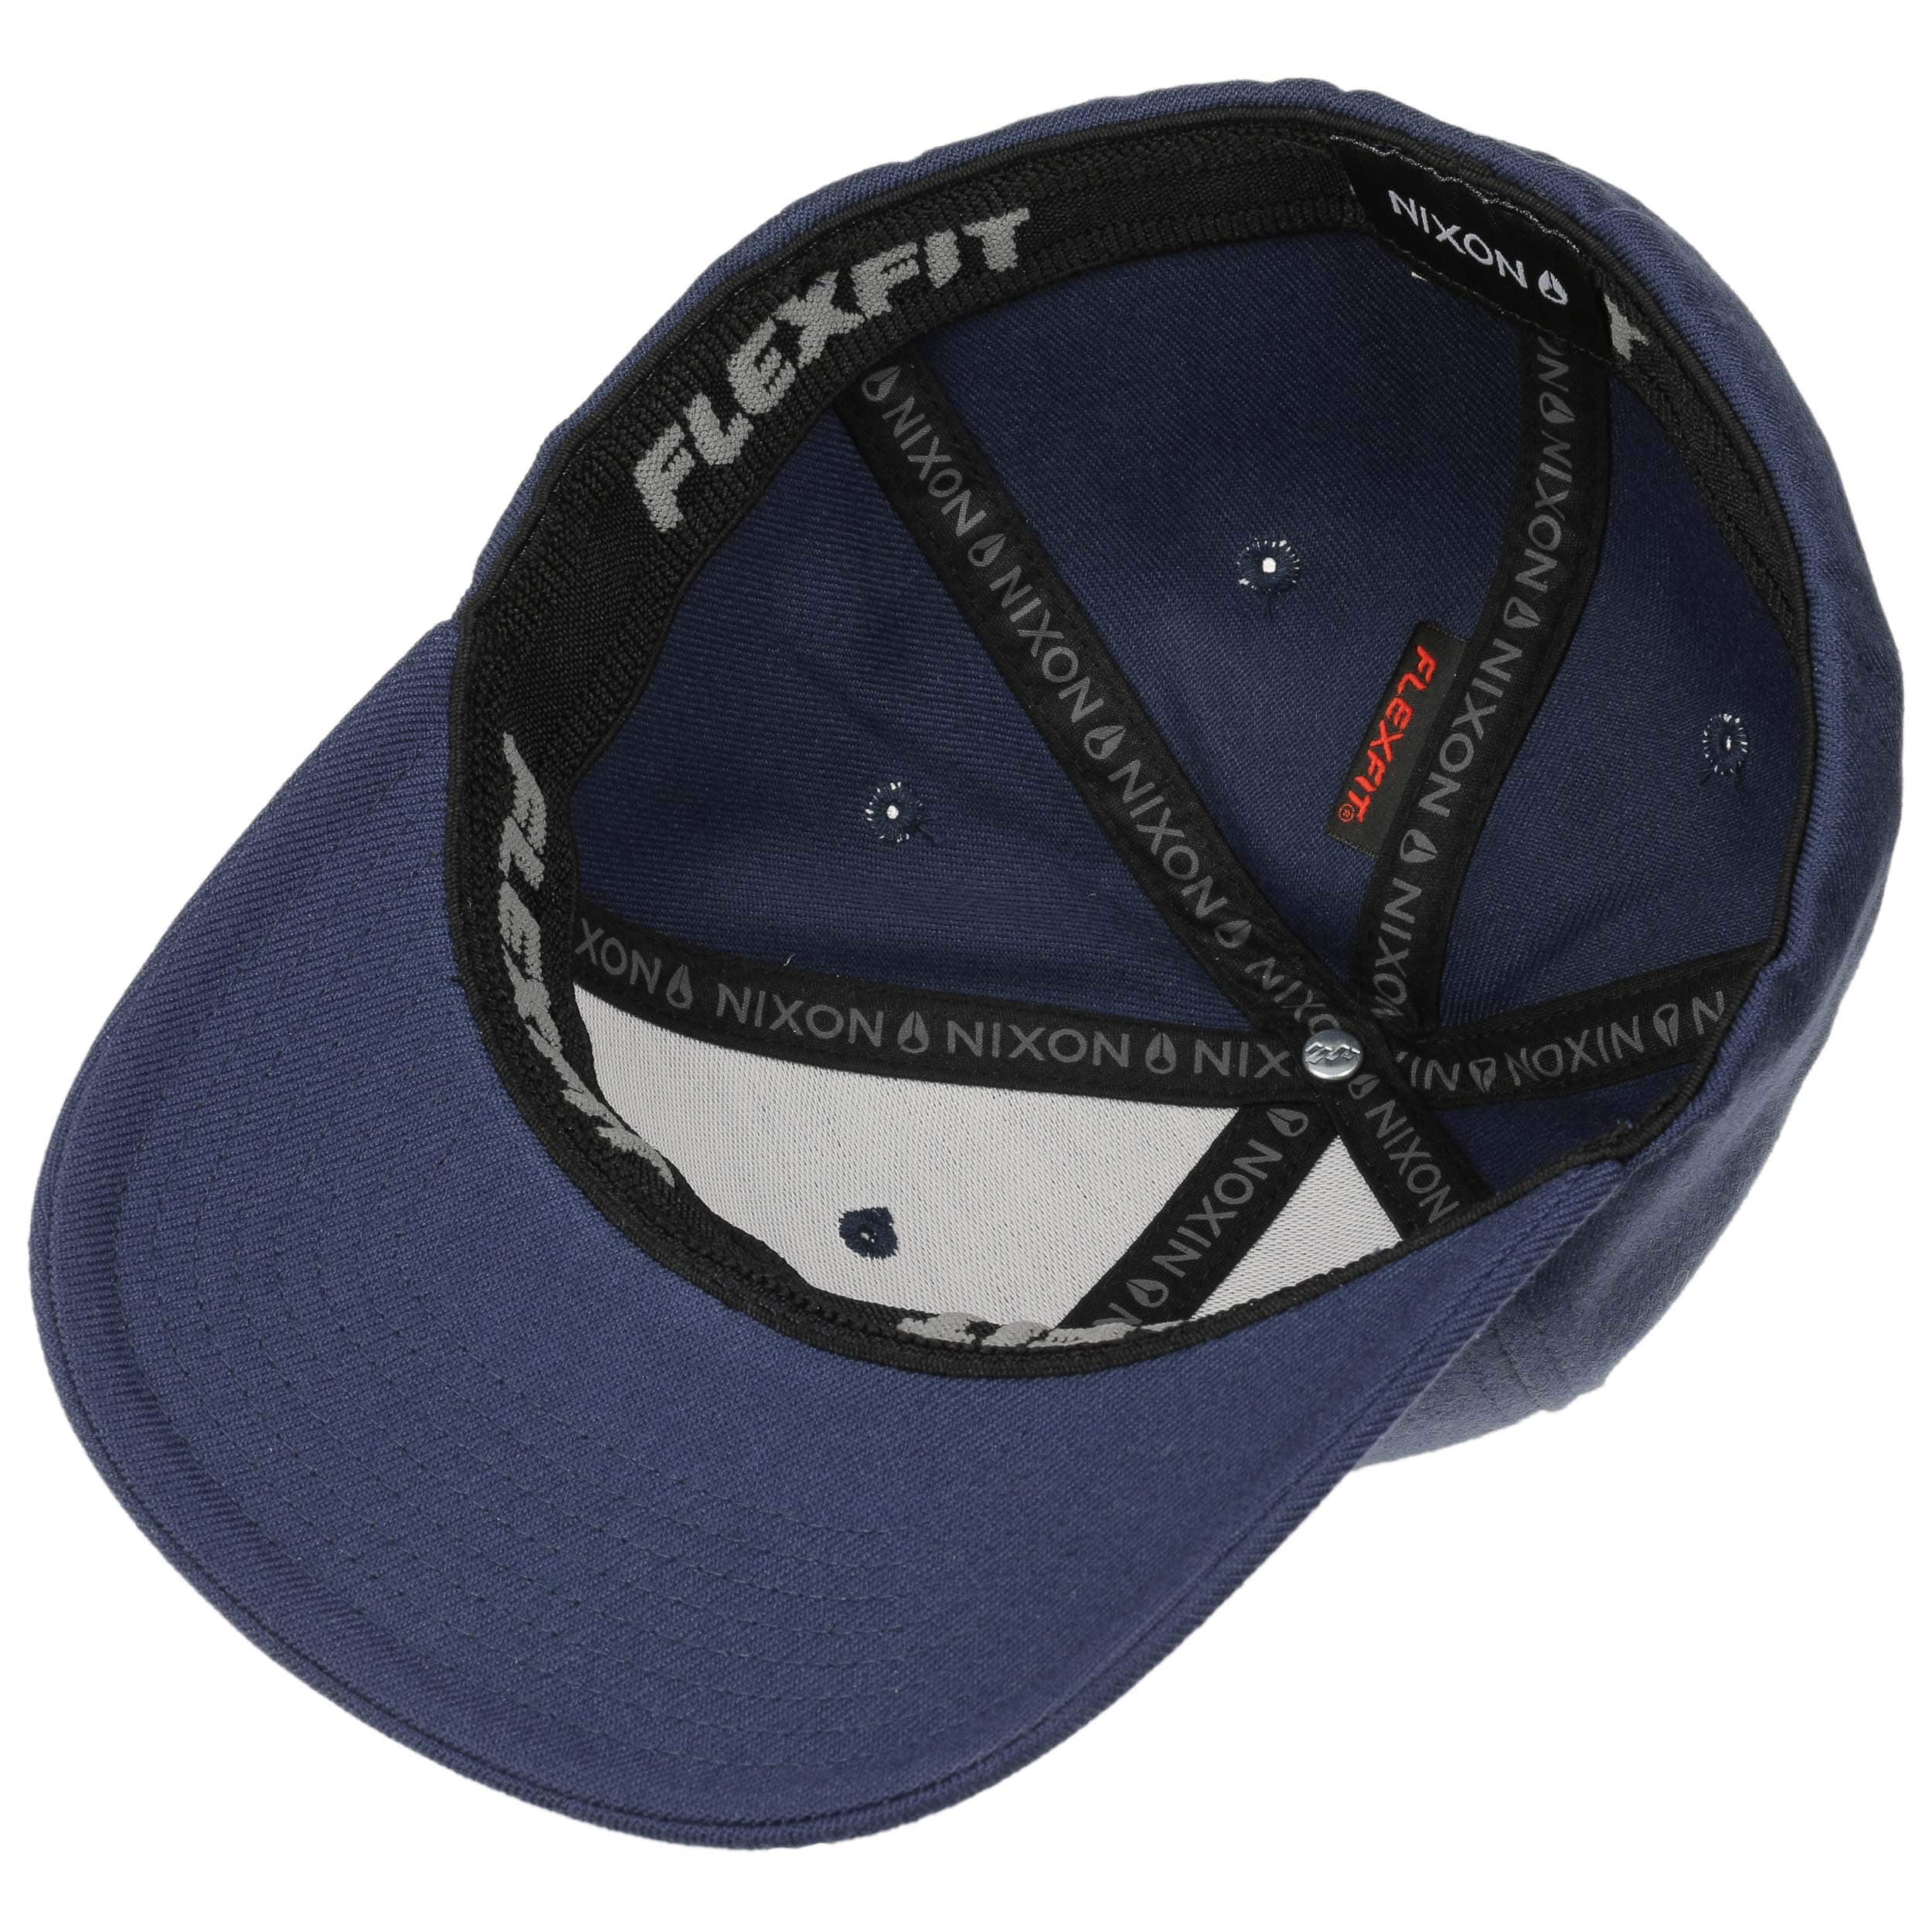 7ee79b391a ... Deep Down Flexfit Cap by Nixon - blue-beige 2 ...